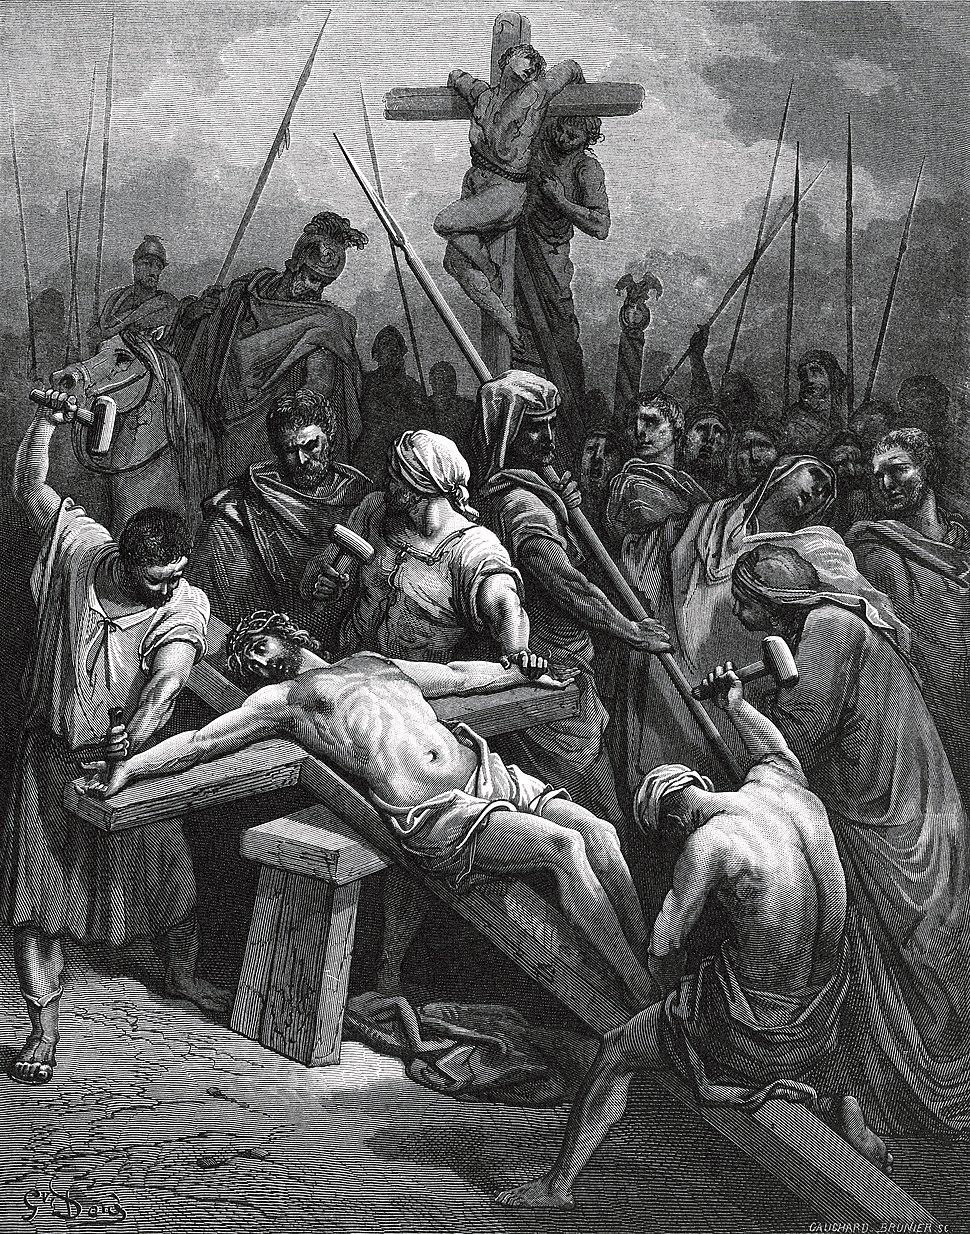 Gustave Doré - Crucifixion of Jesus